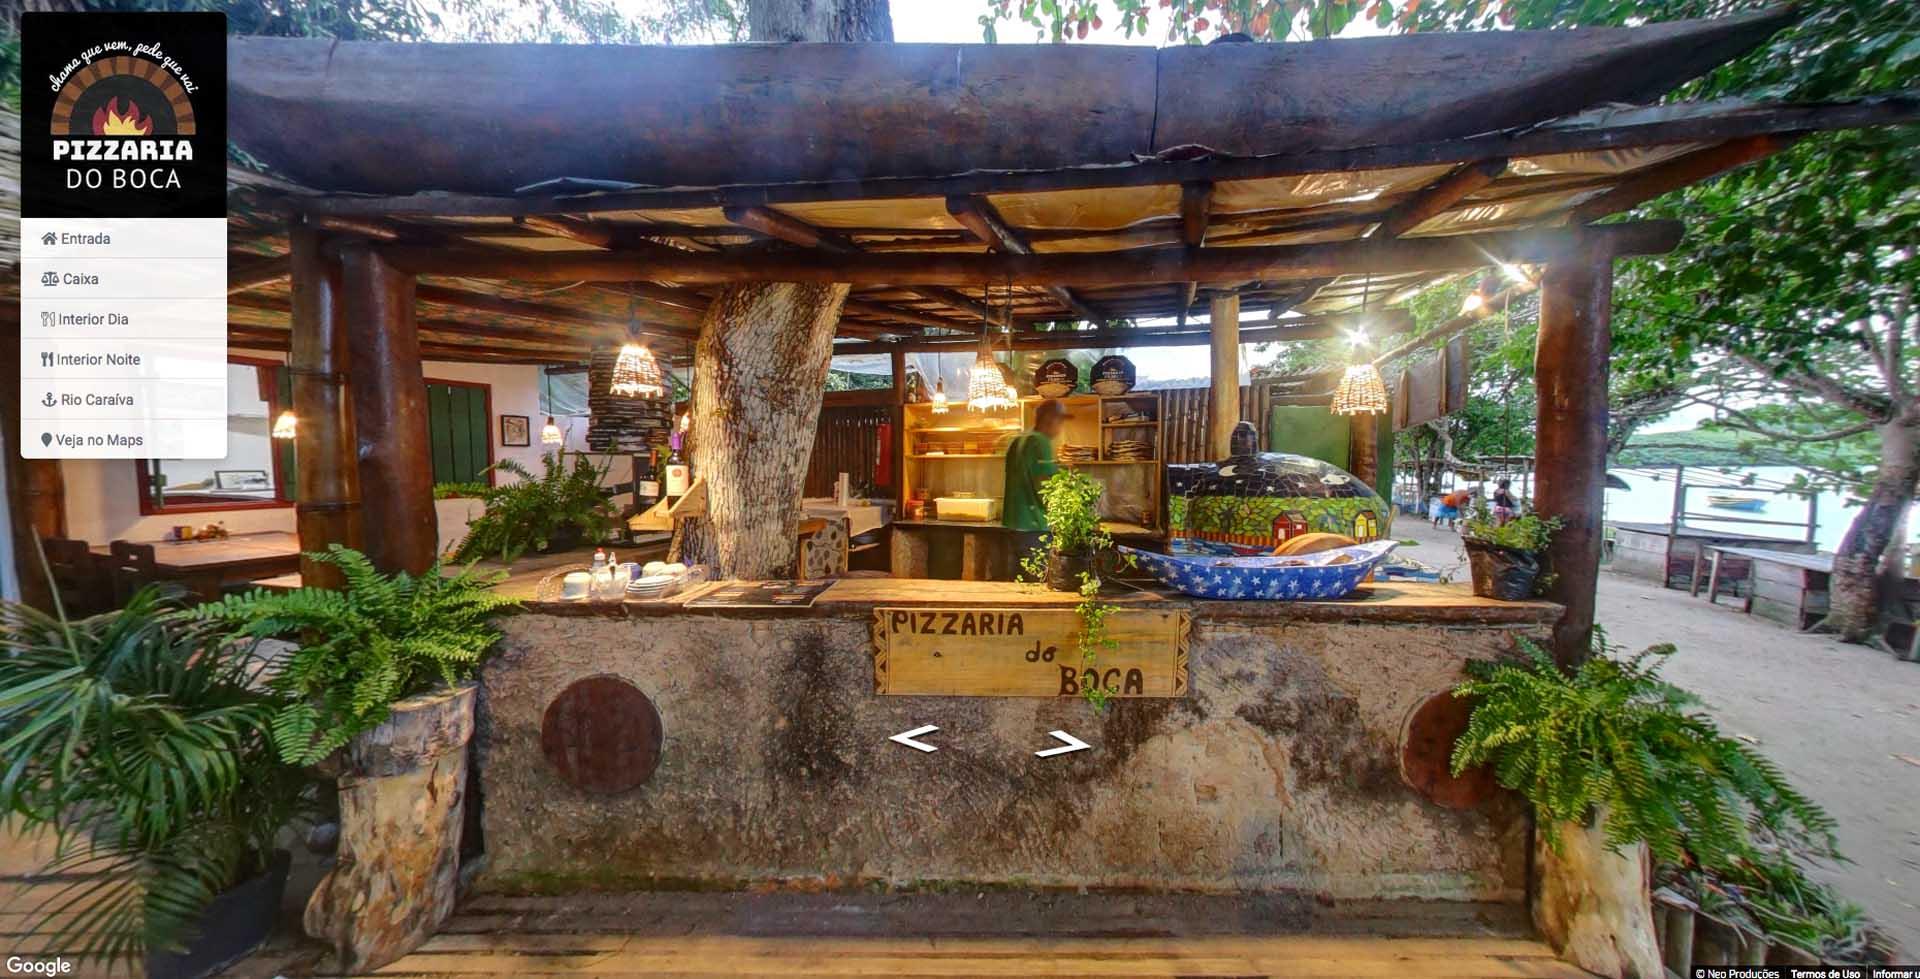 Boca Pizzaria